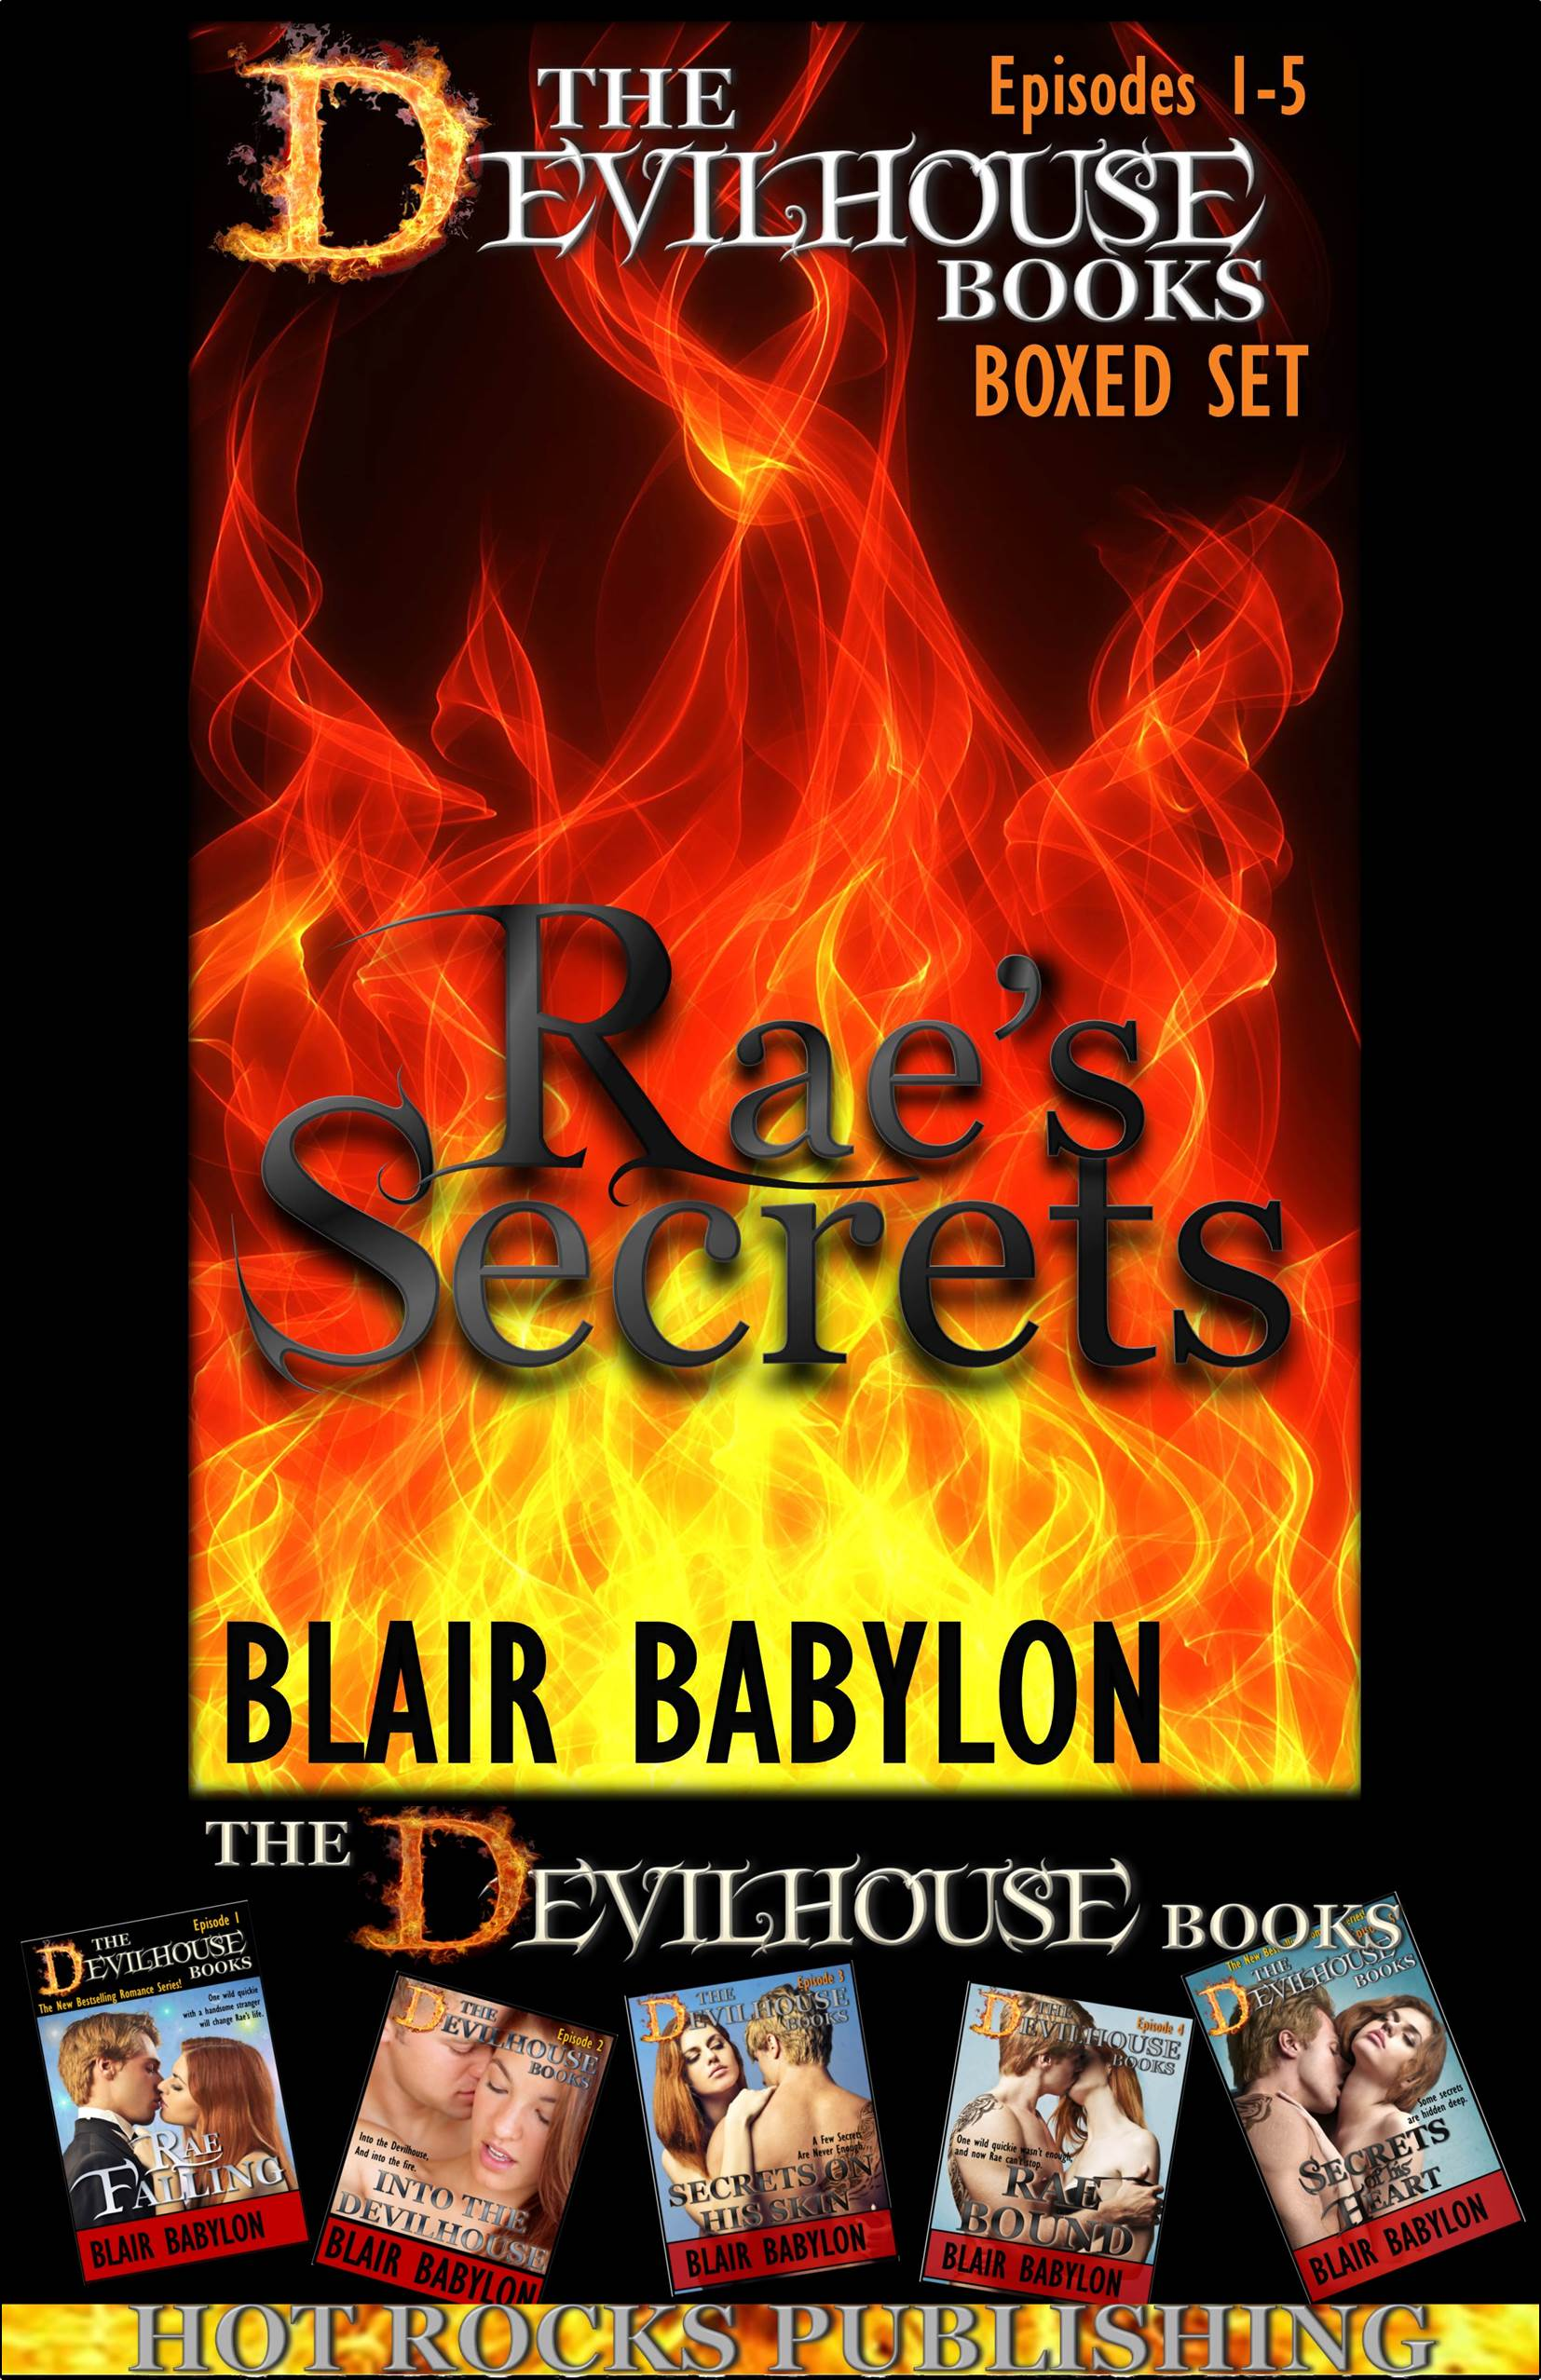 Blair Babylon - Rae's Secrets: Erotic Romance Boxed Set, Episodes 1 – 5 of The Devilhouse Books